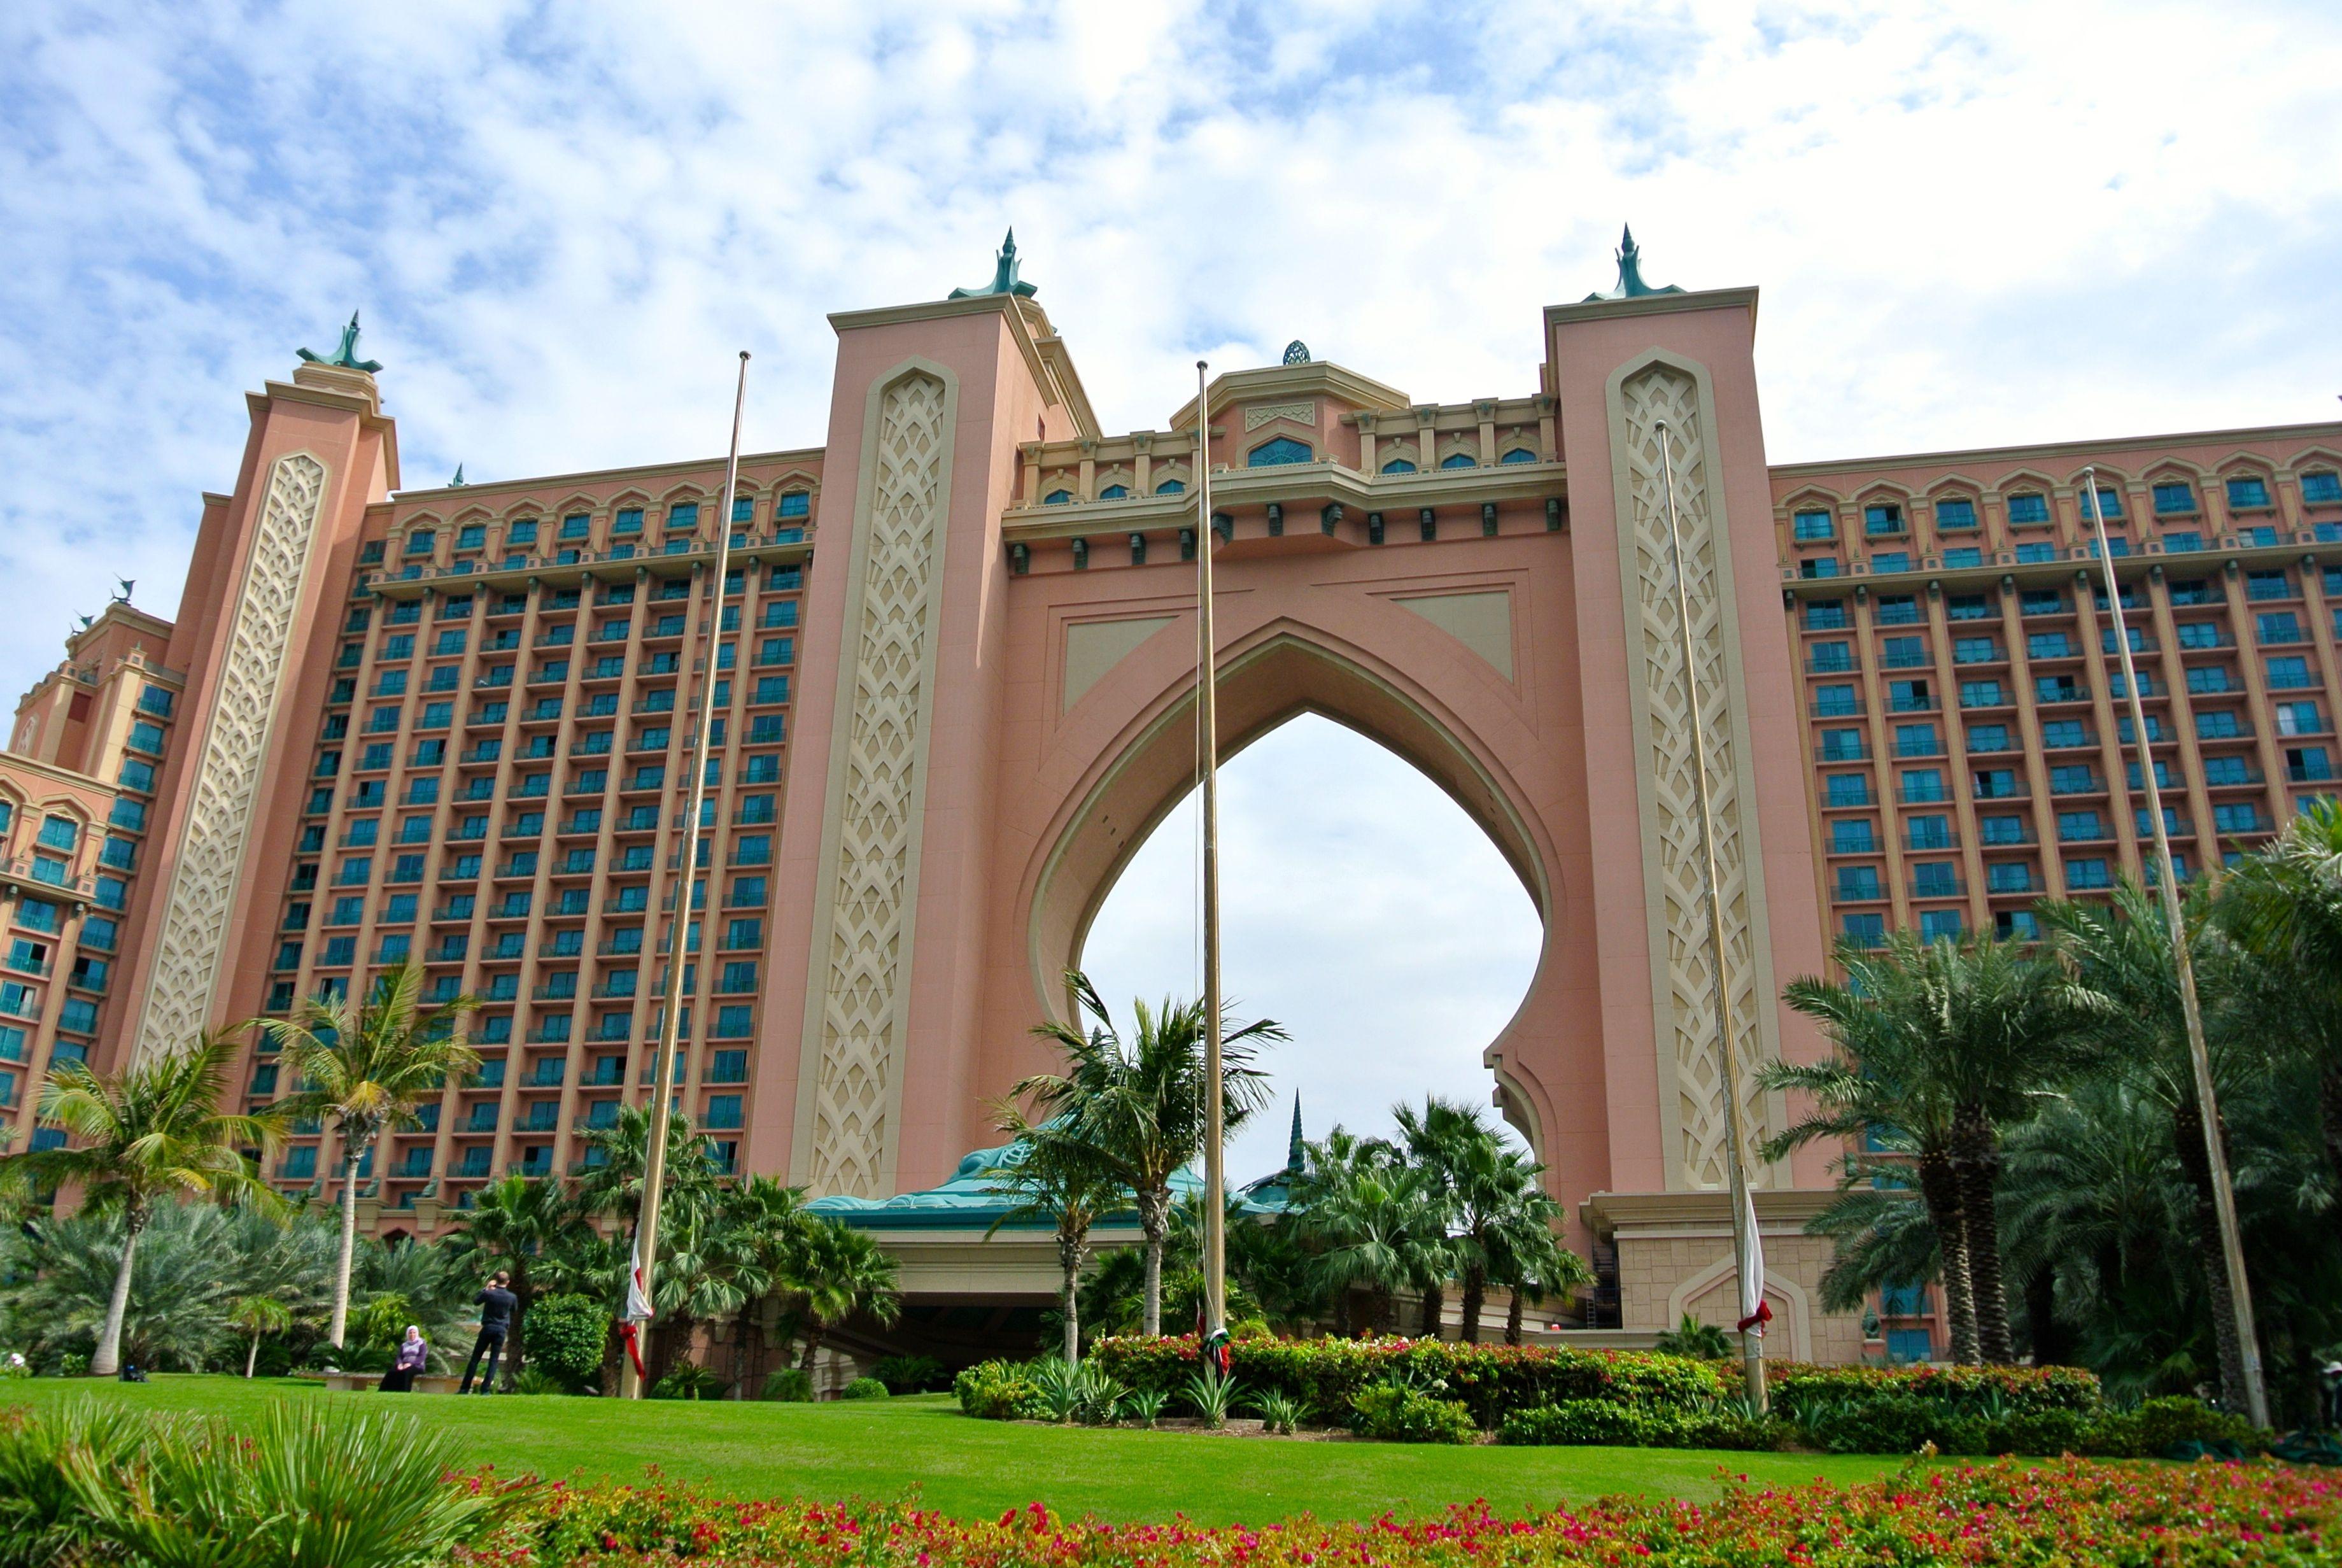 The Atlantis Hotel